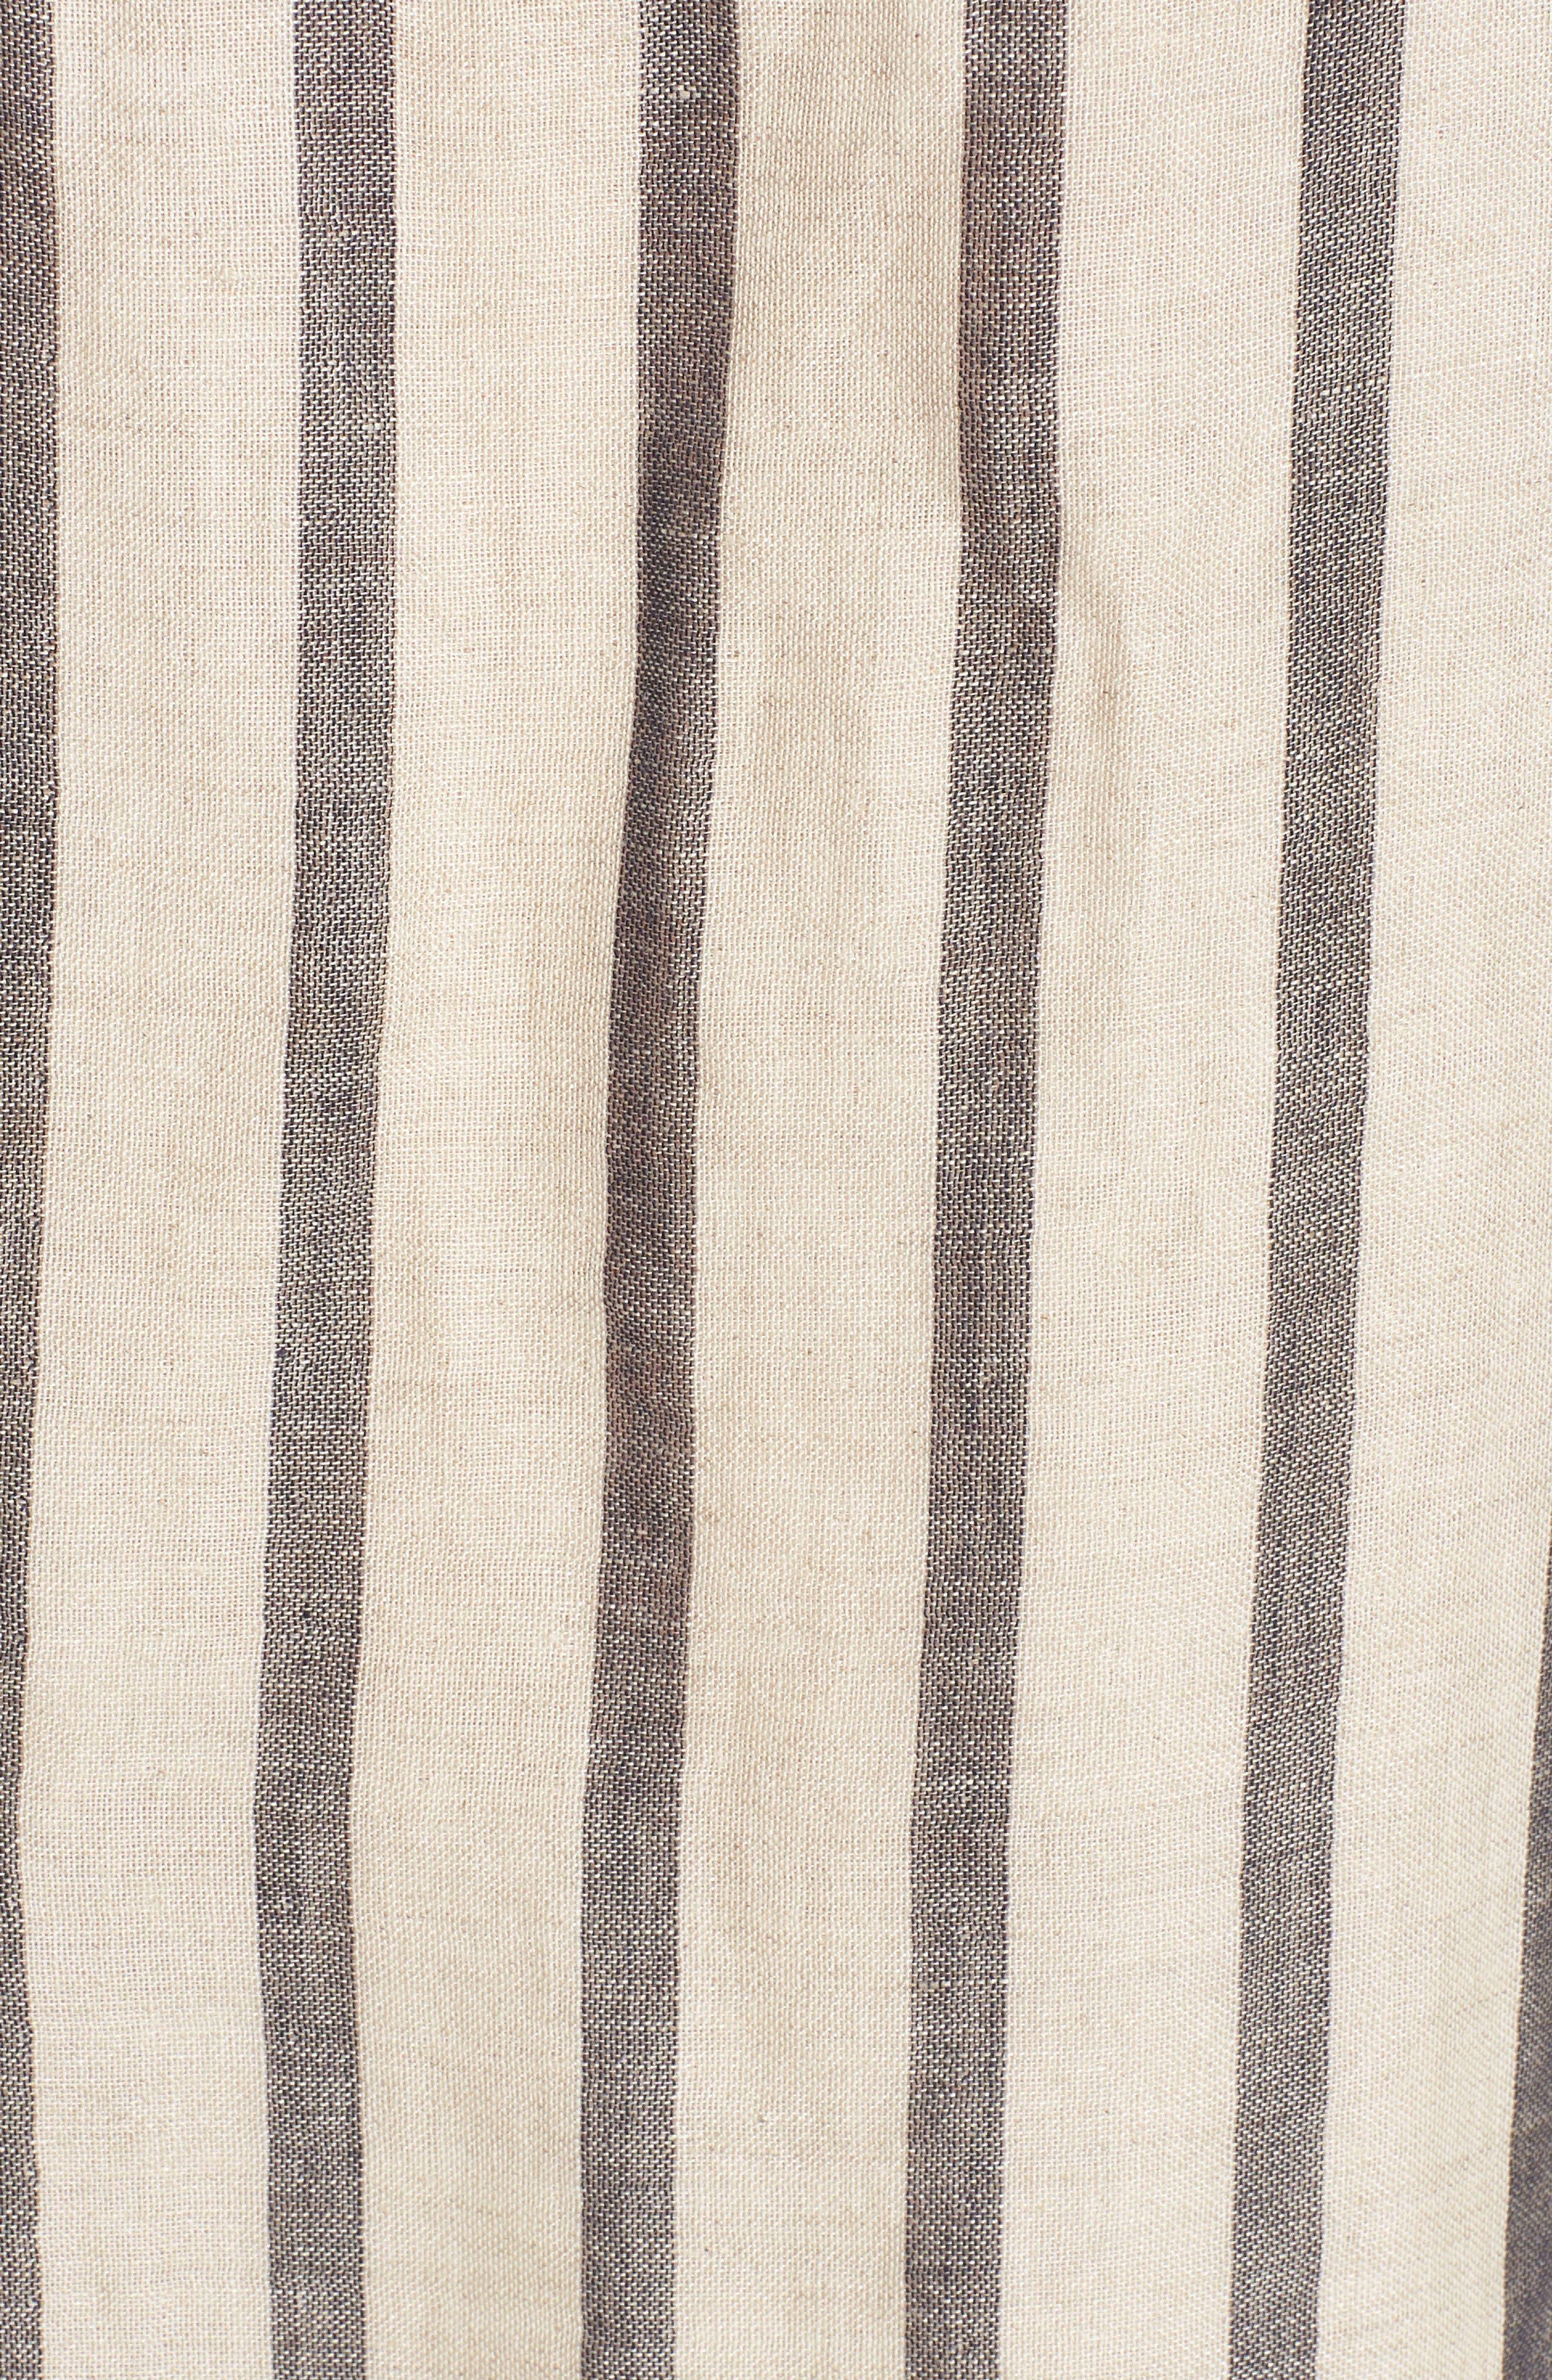 Stripe Linen & Cotton Shift Dress,                             Alternate thumbnail 5, color,                             Natural